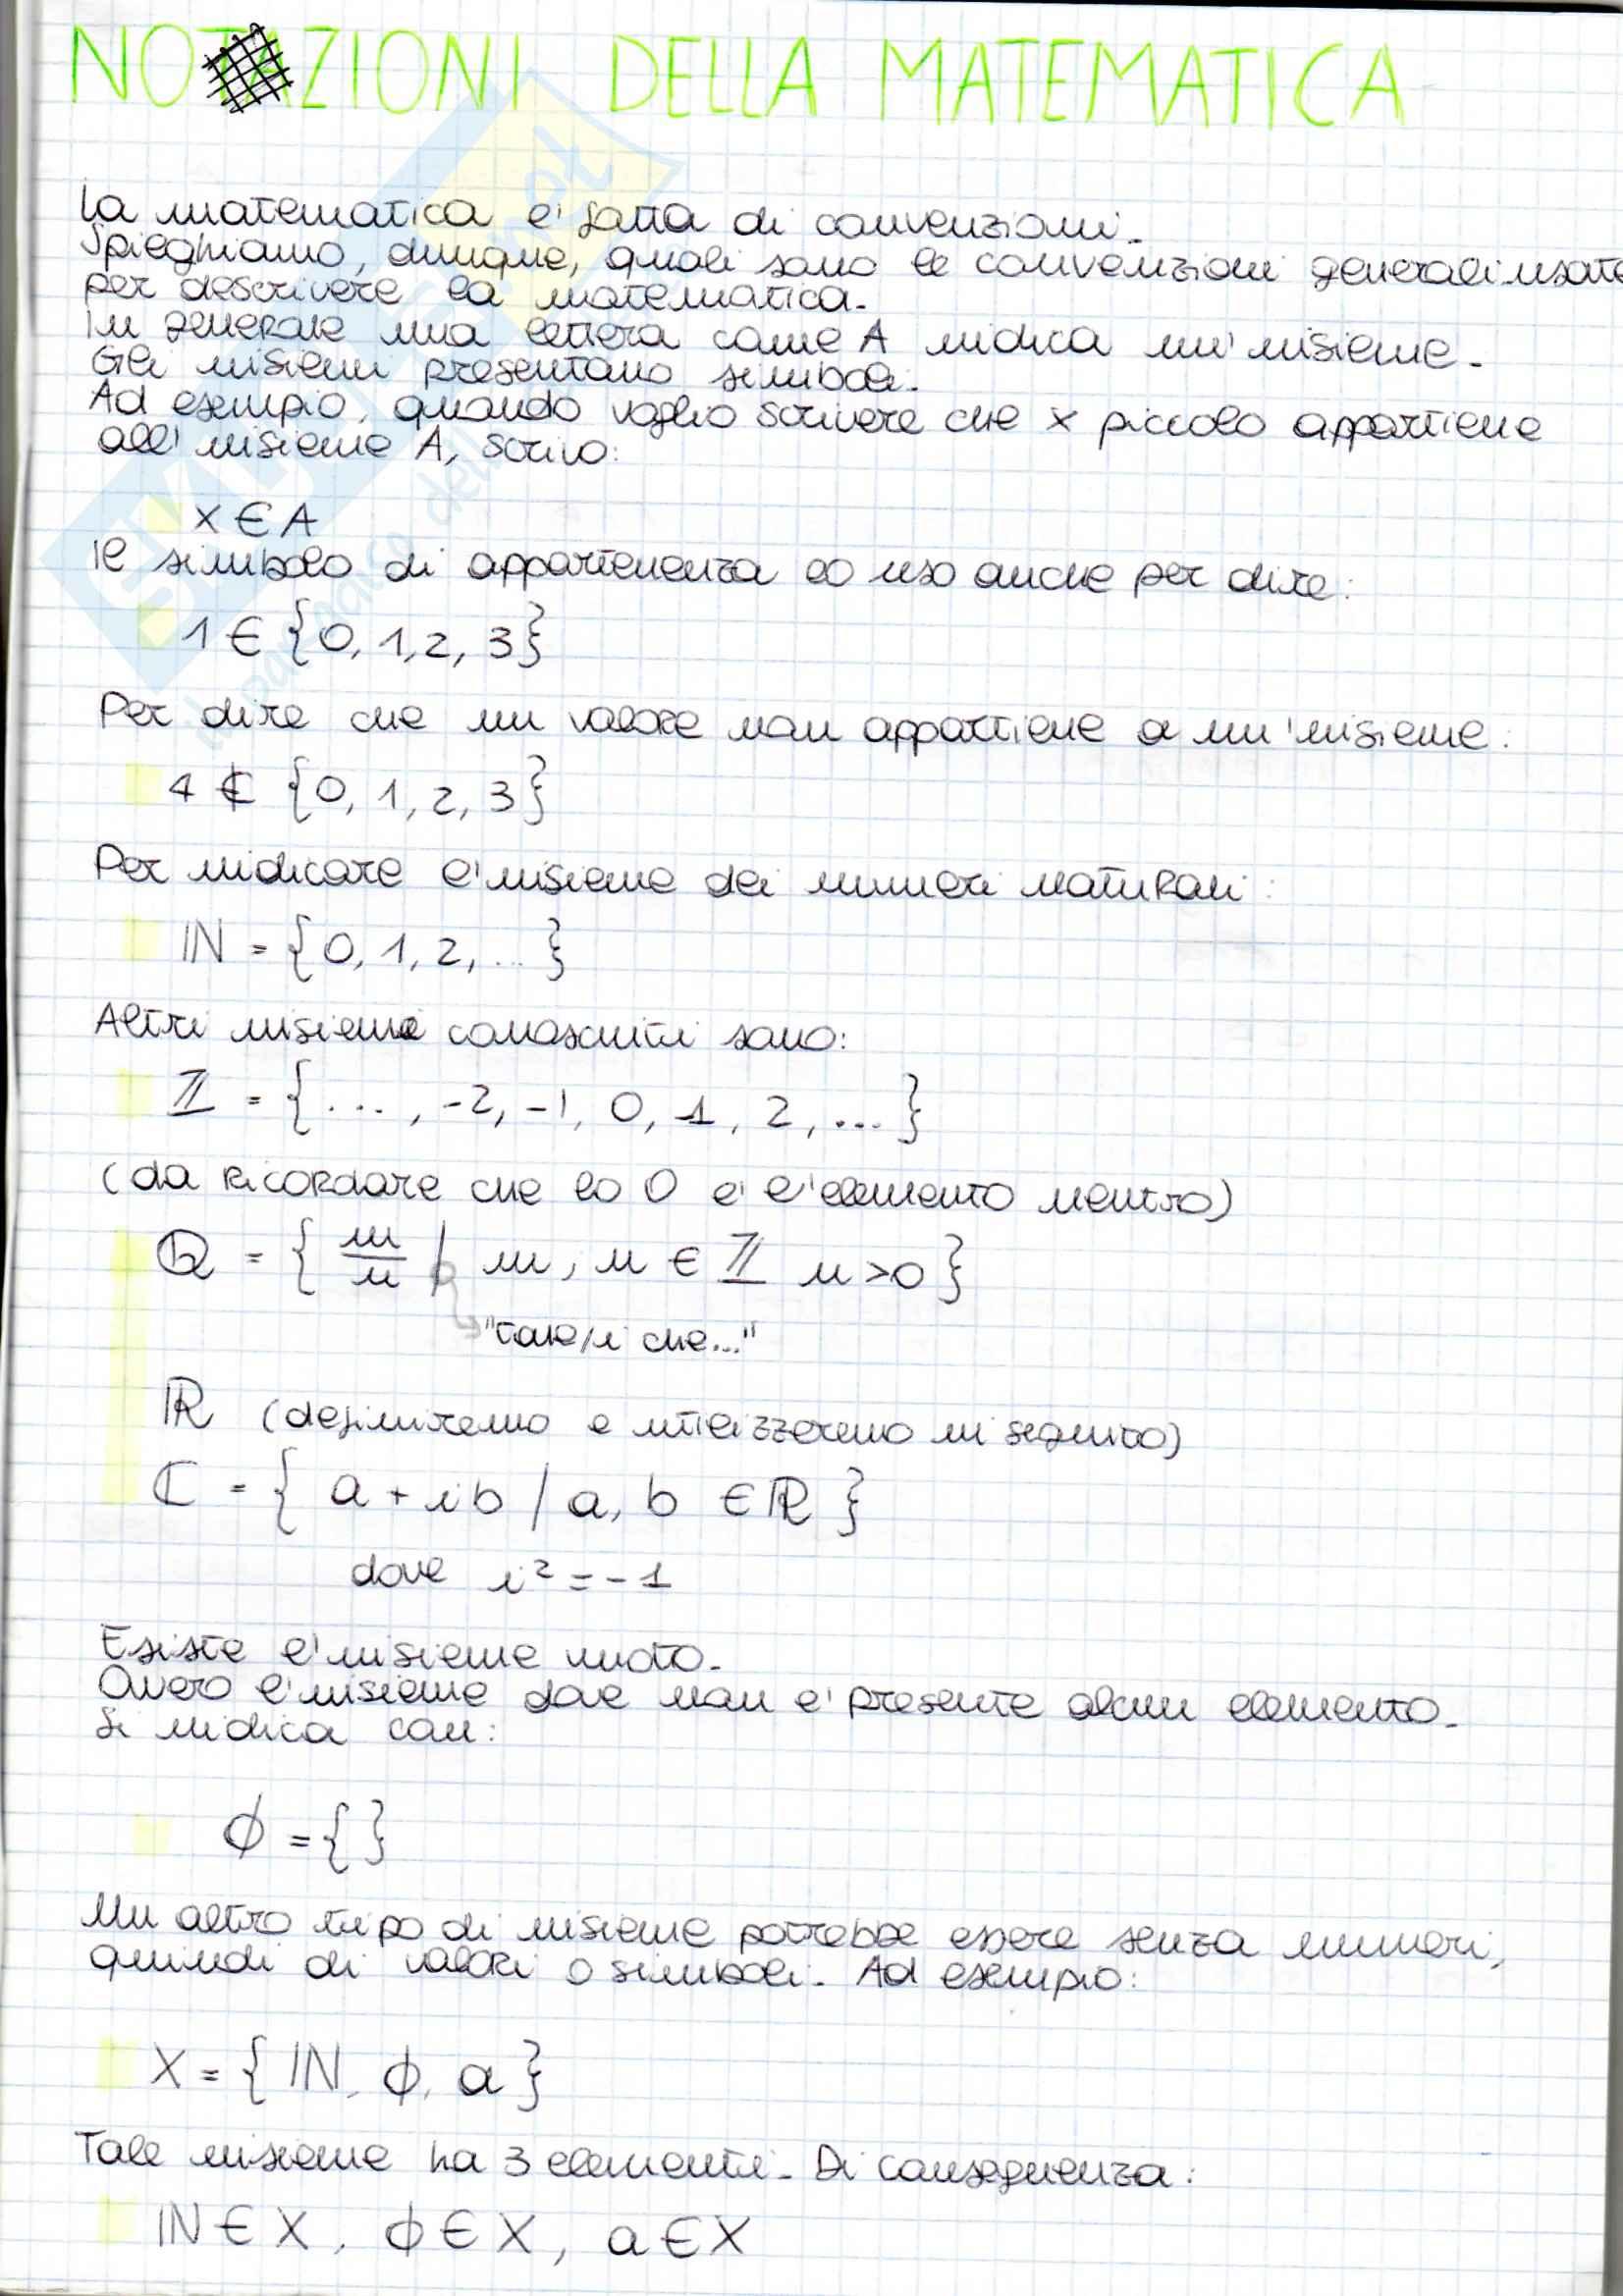 Matematica Discreta - Appunti parte 1